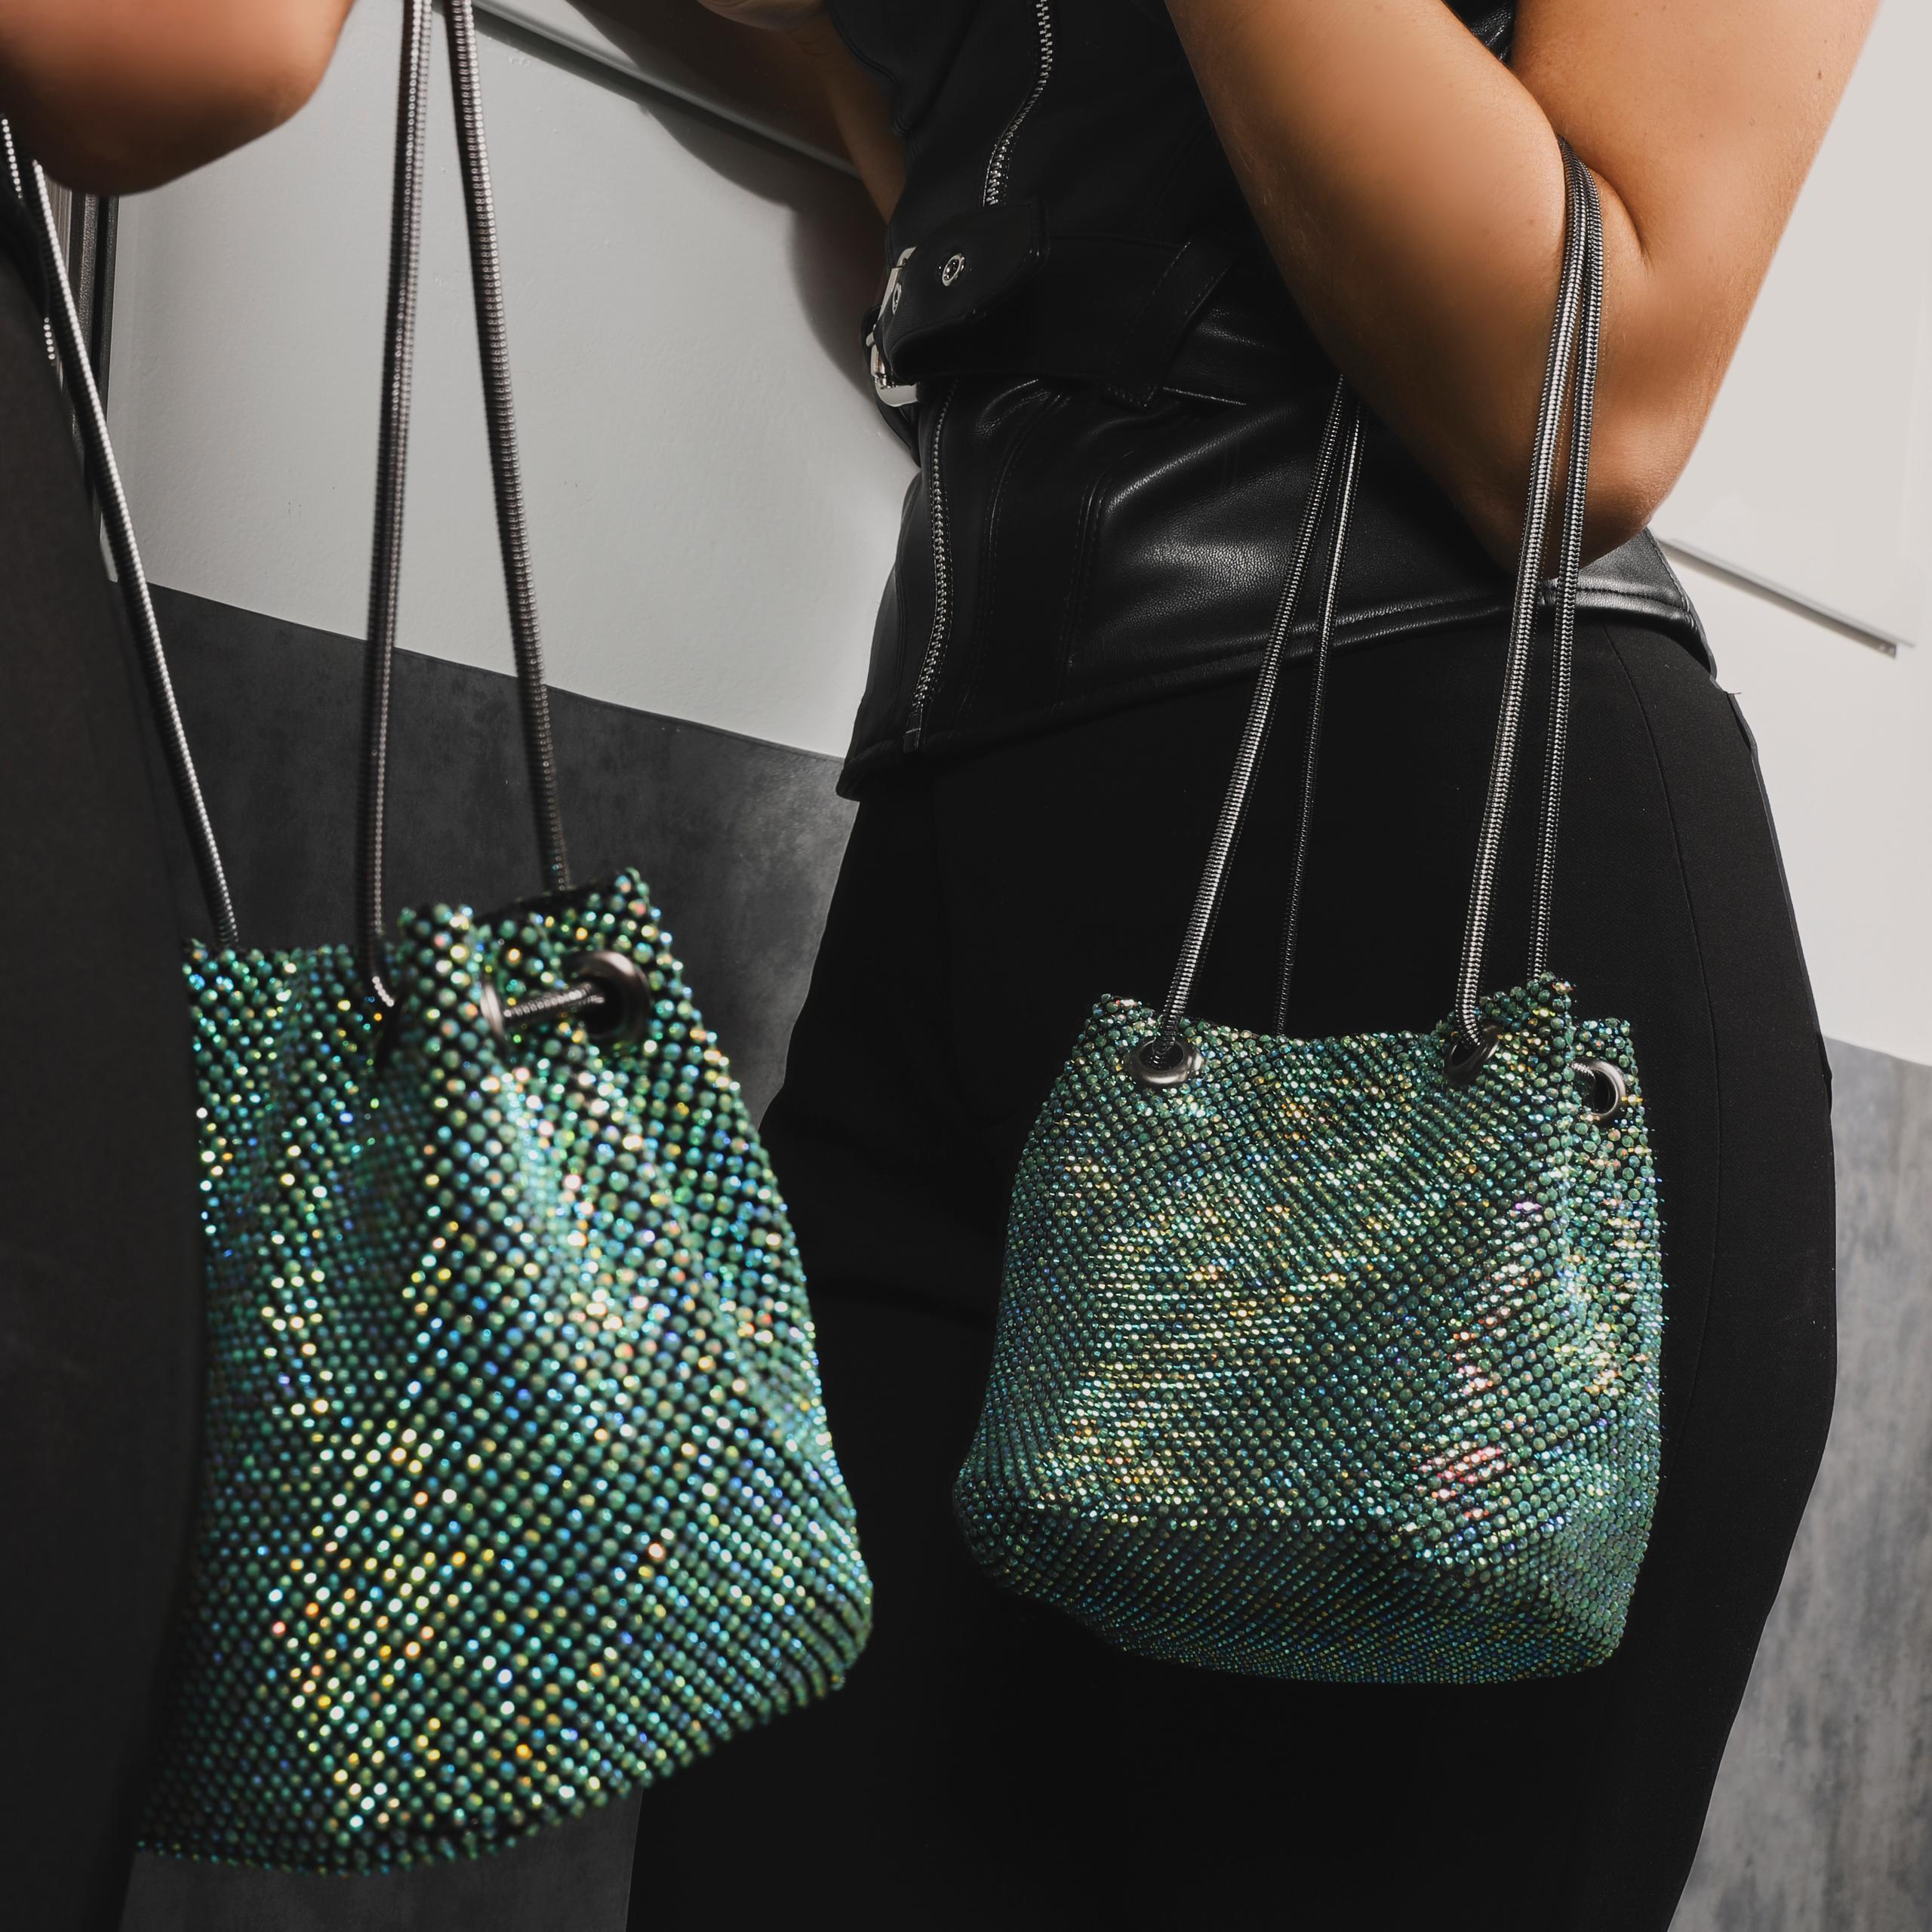 EGO Cross Body  Bucket Bag In Green Diamante,, Green  - female - Size: One Size